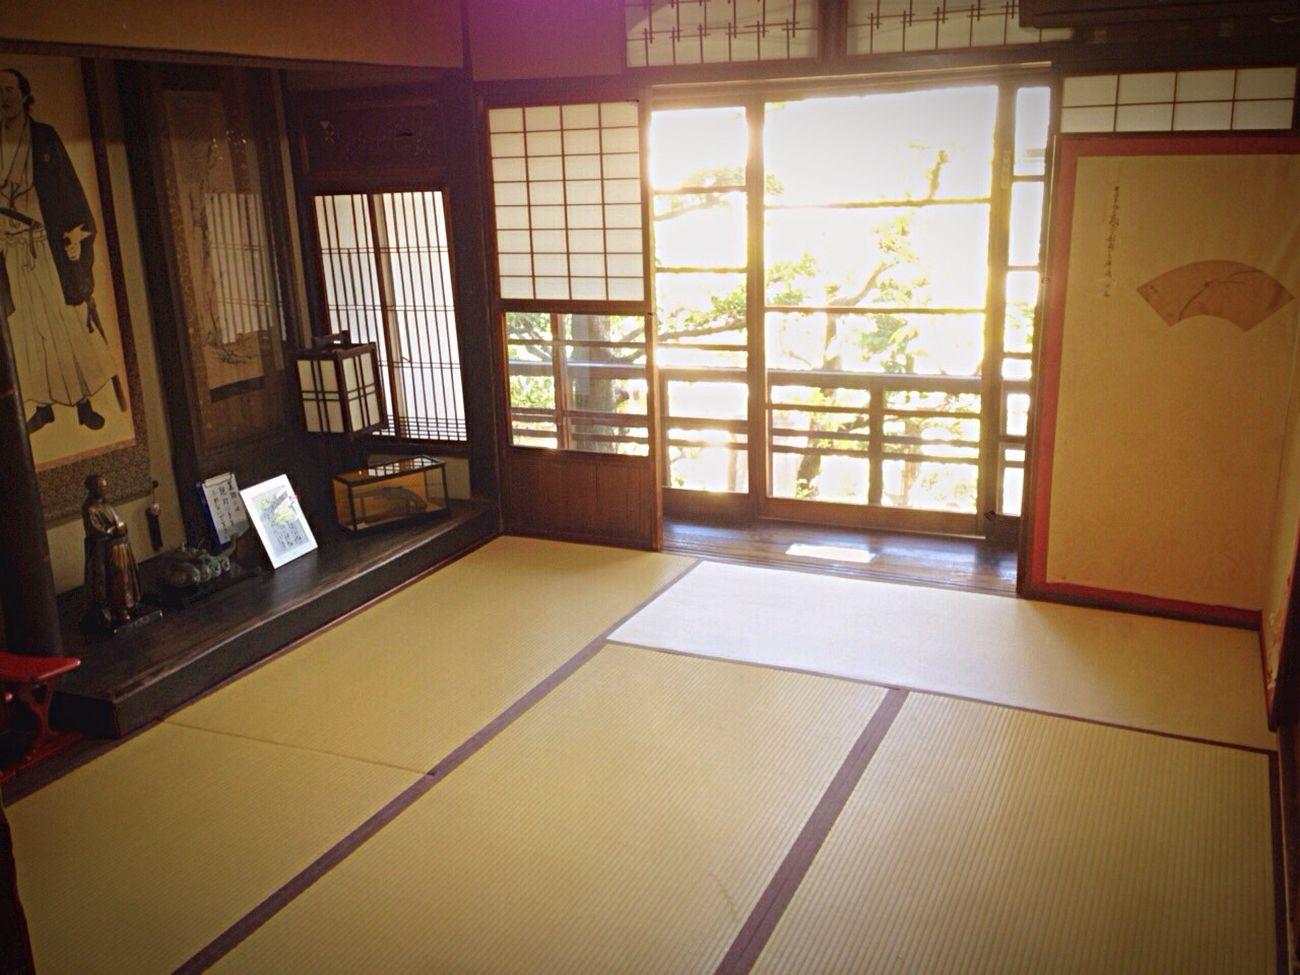 Kyoto Japan Terada-ya Fushimi Sakamoto Ryoma Japanese Style Room 京都 日本 寺田屋 坂本龍馬 伏見